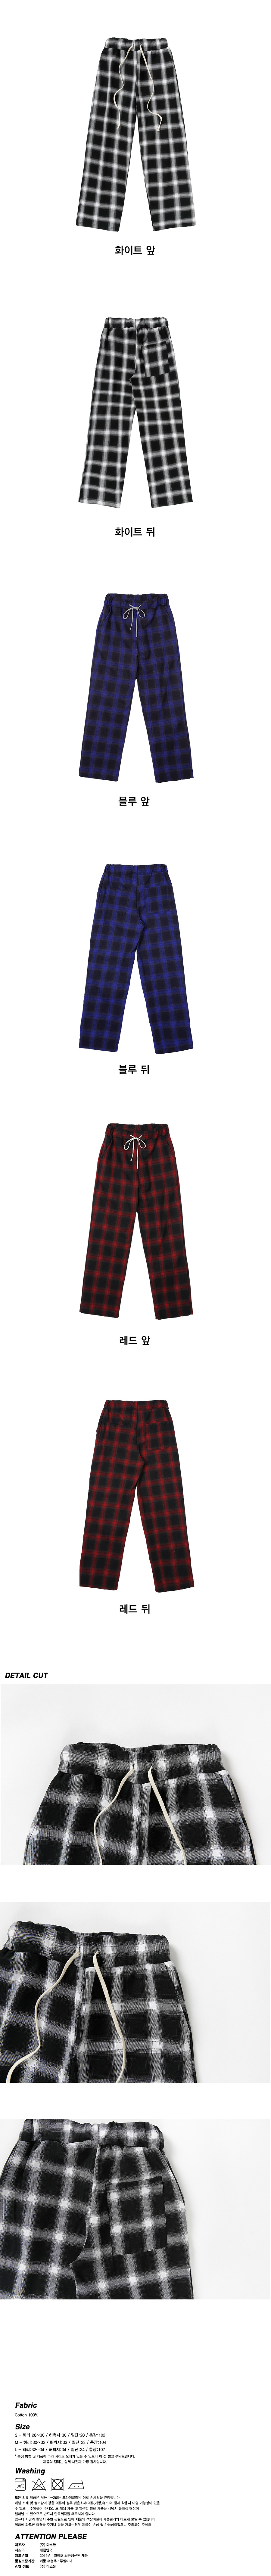 cotton_check_pants.jpg